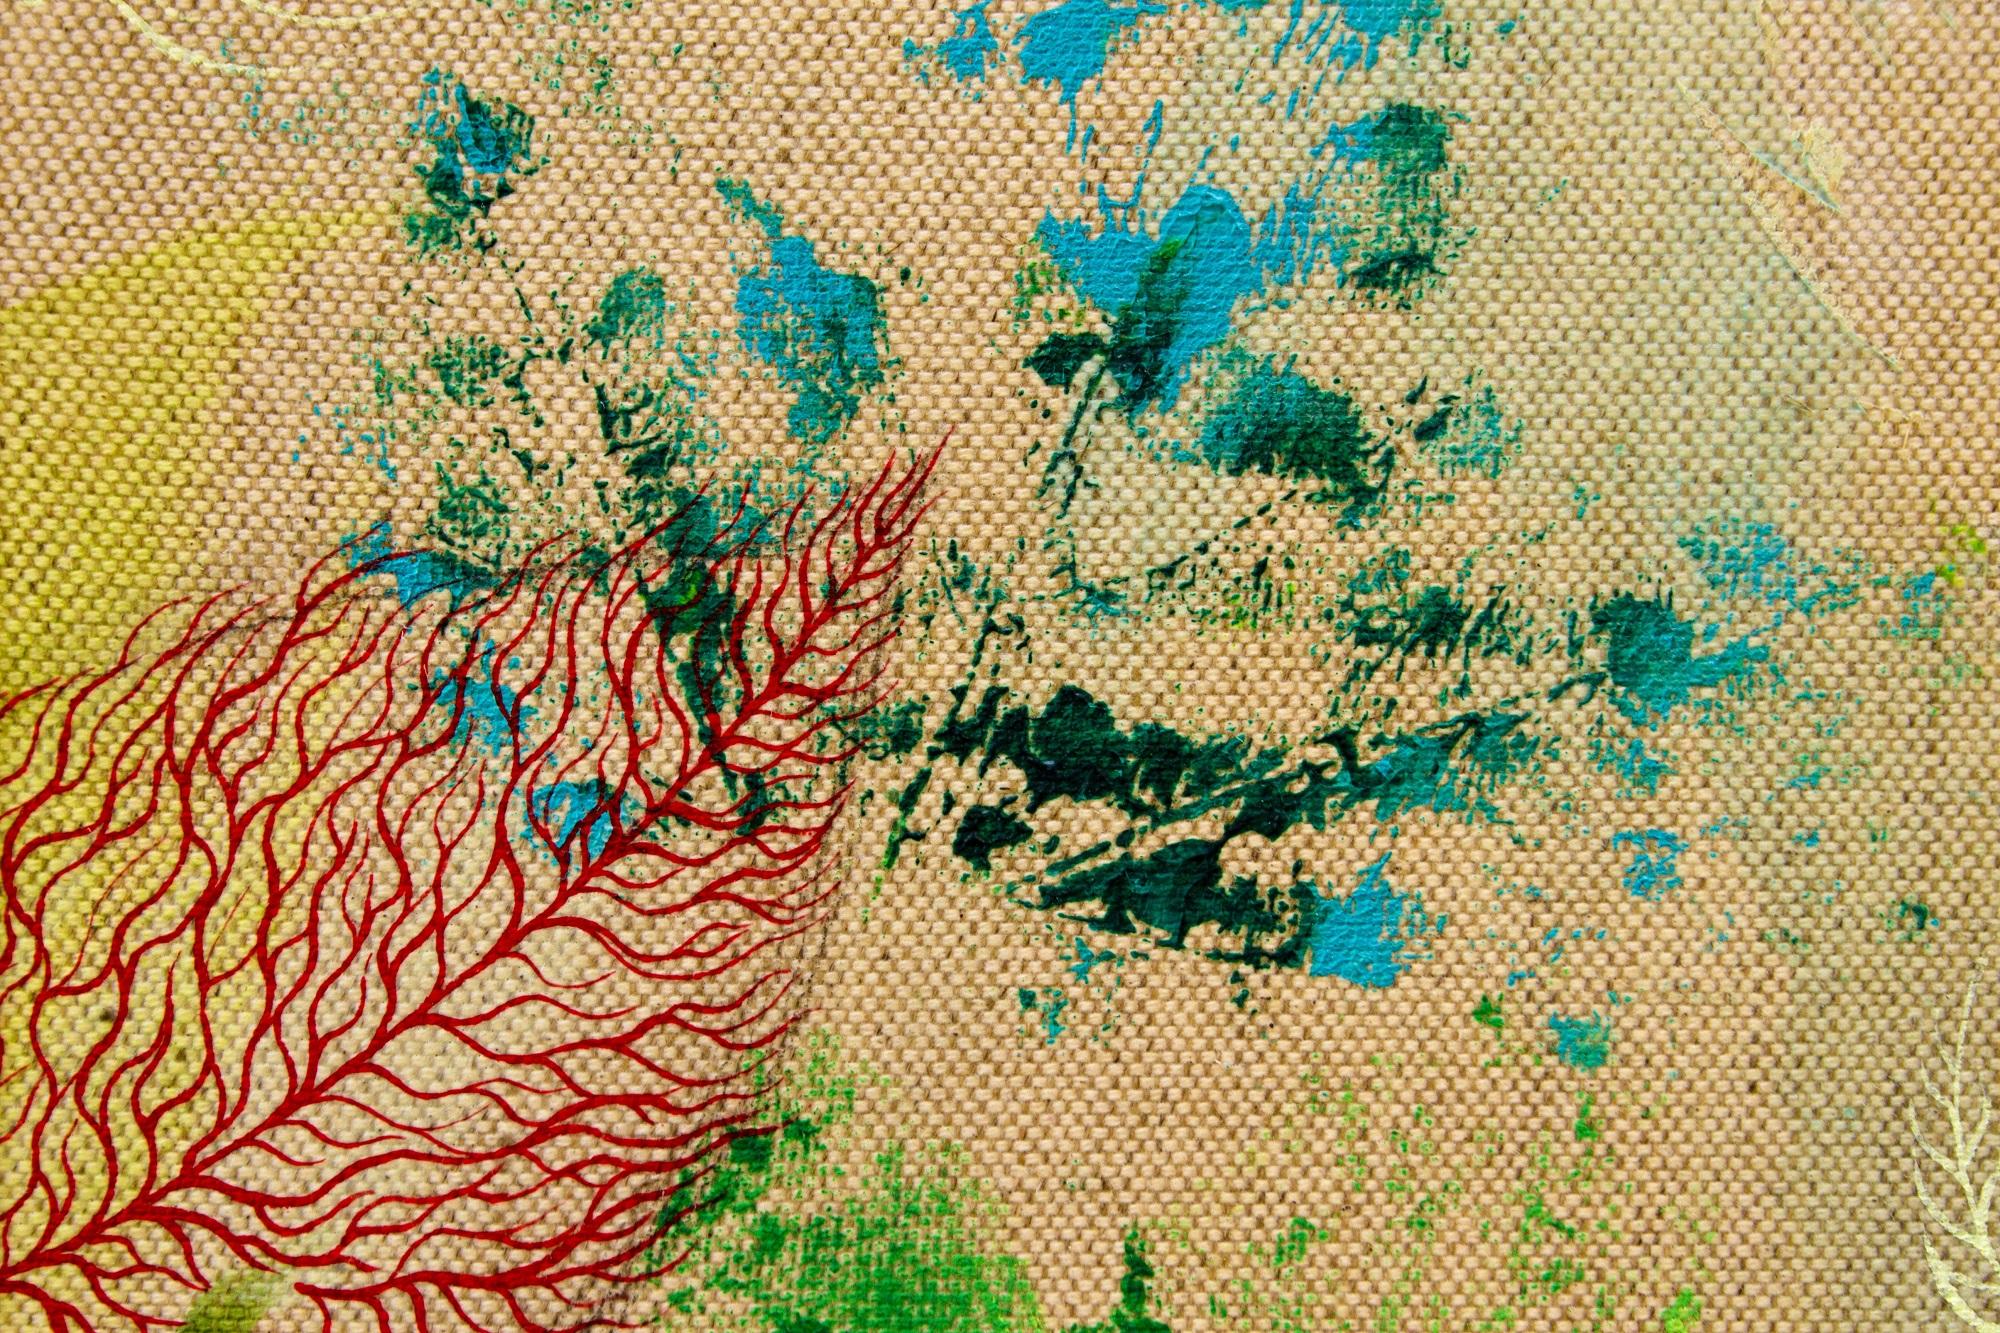 Gola Hundun 7,6 Billion & Still Growing 19 Karen Contemporary Artspace